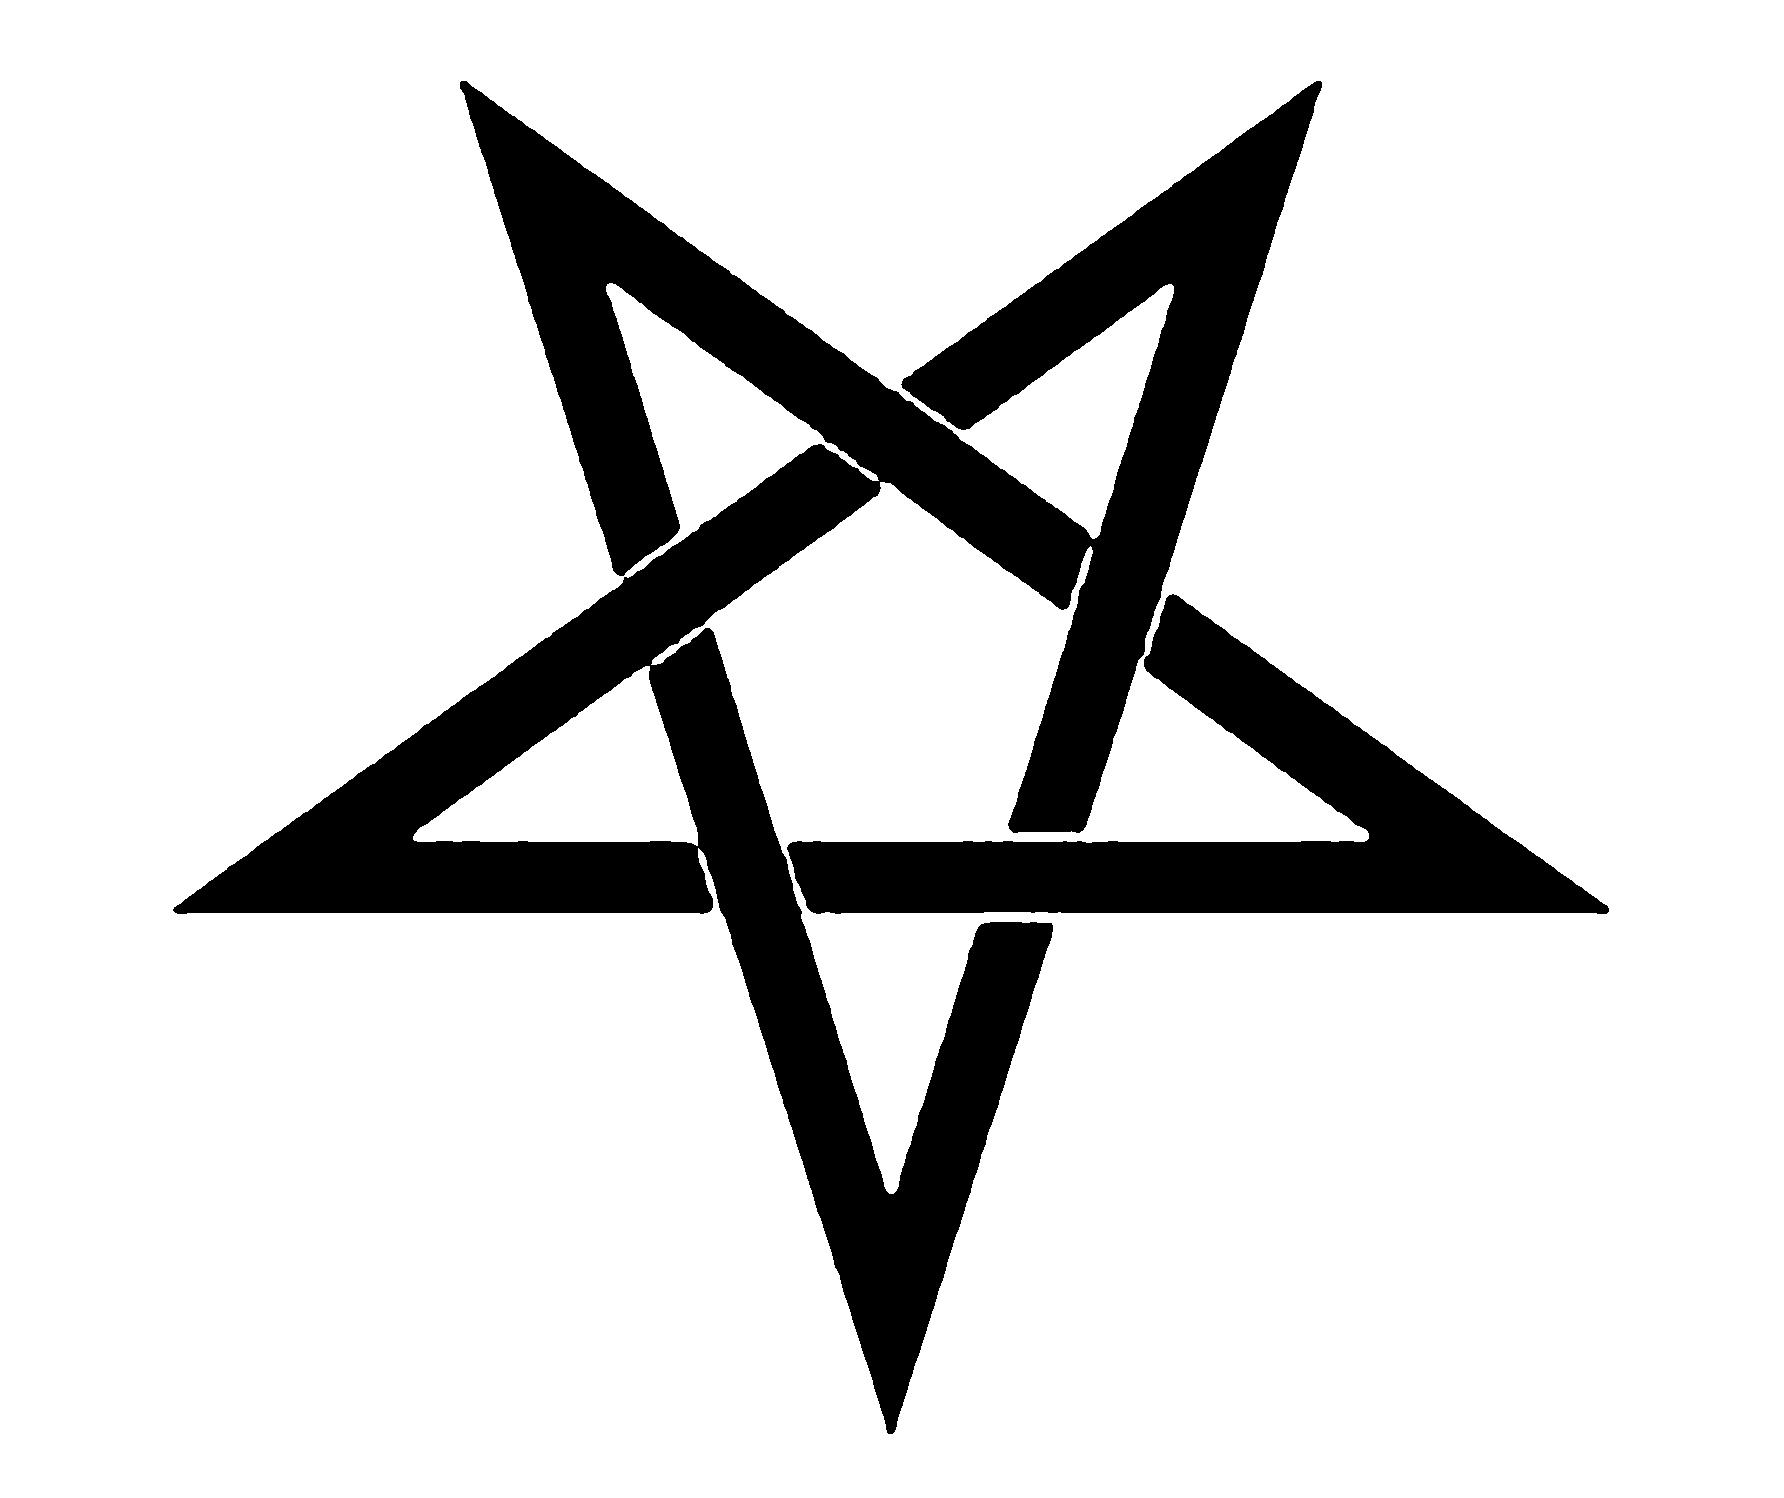 SATAN IS MY DADDY (T-SHIRT & HOODIE) Pastel, Goth, Dolls, Kill, Star, Grunge, Aesthetic, Sweater, Alternative, Model, Clothing